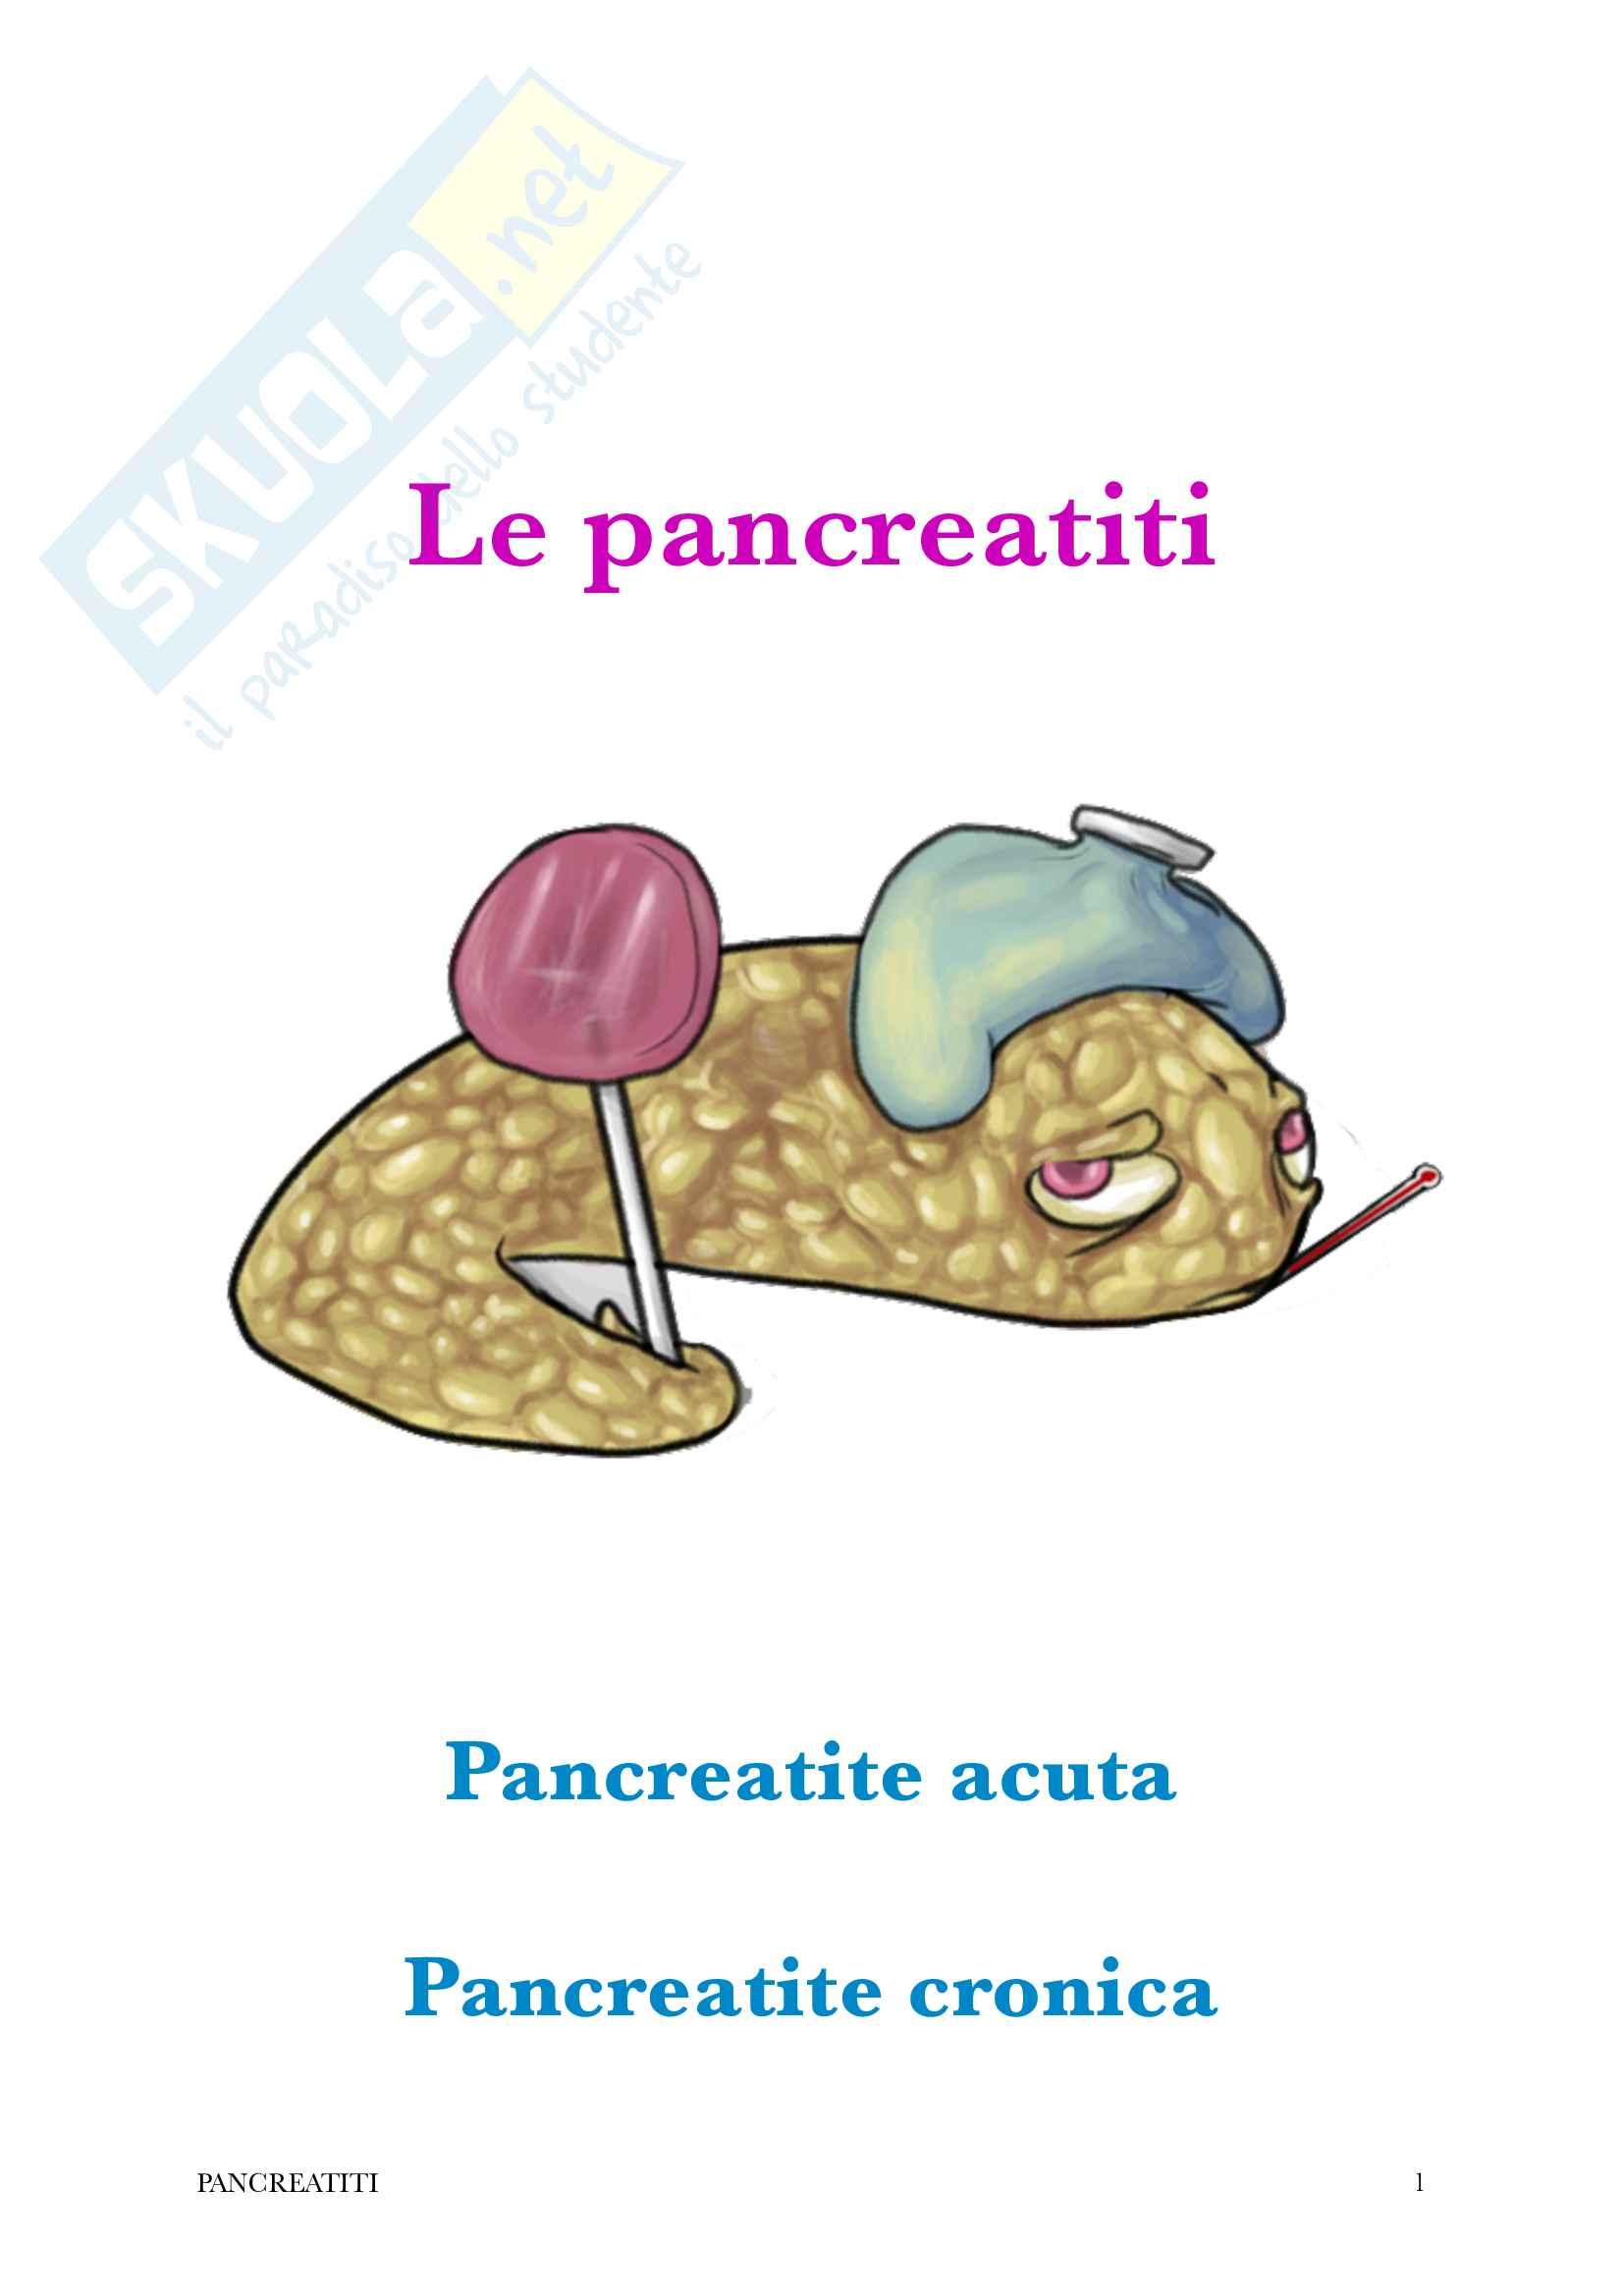 Le pancreatiti